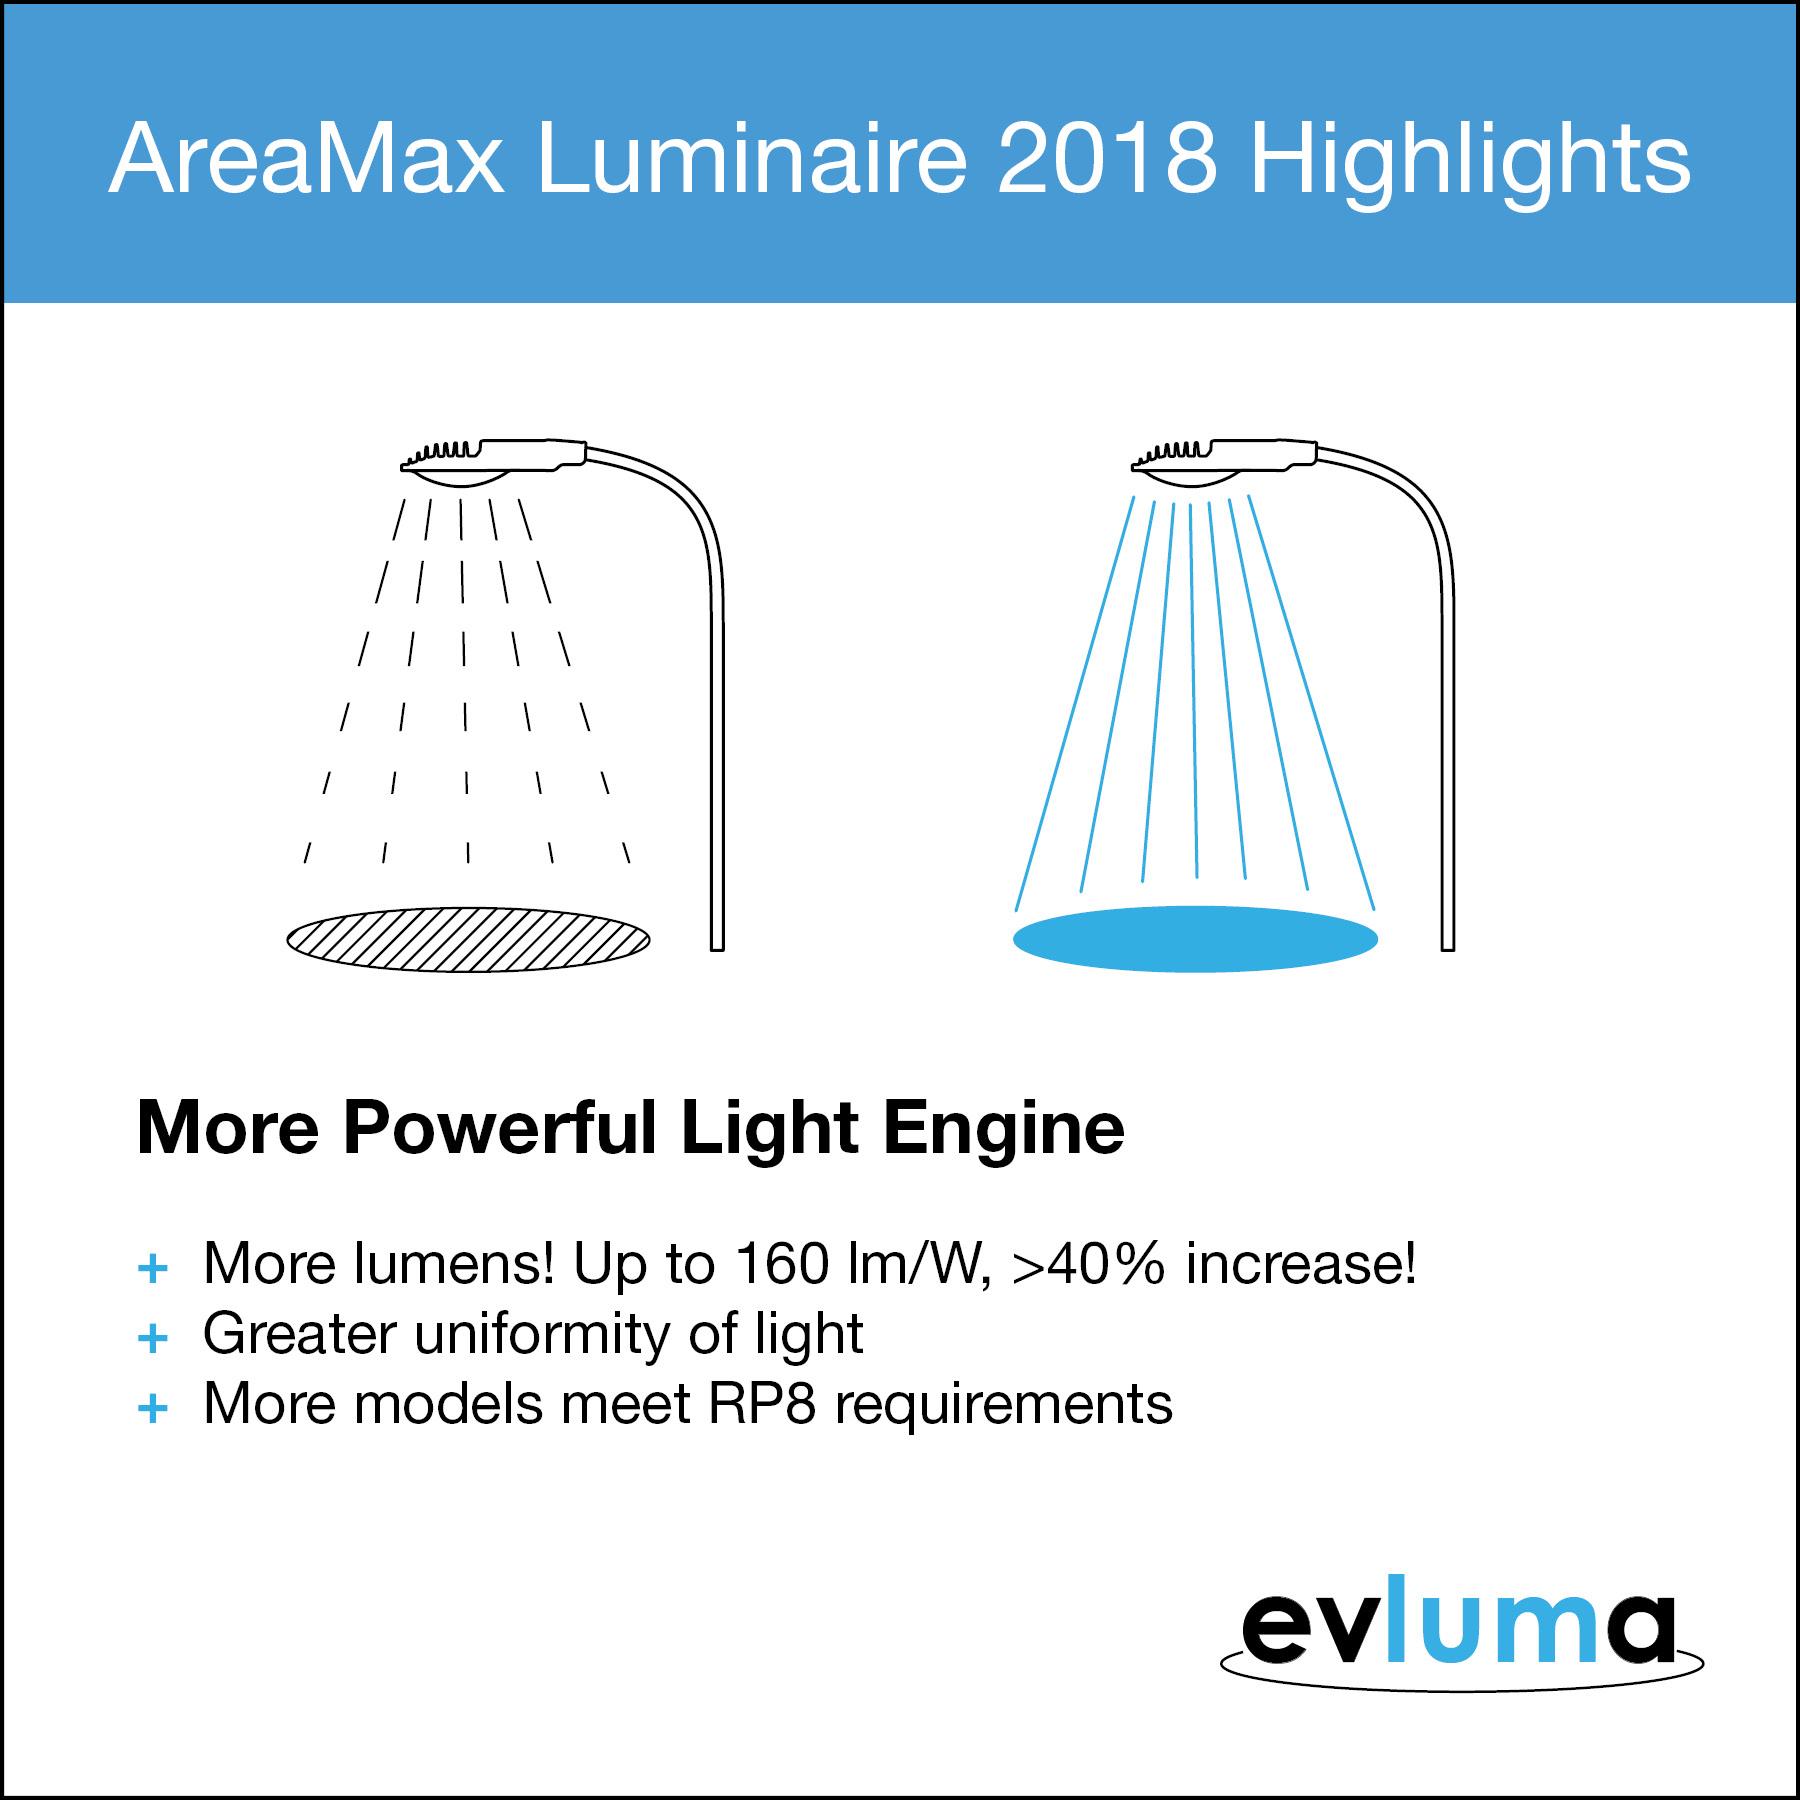 AreaMax Highlights - A More Powerful Light Engine | Evluma